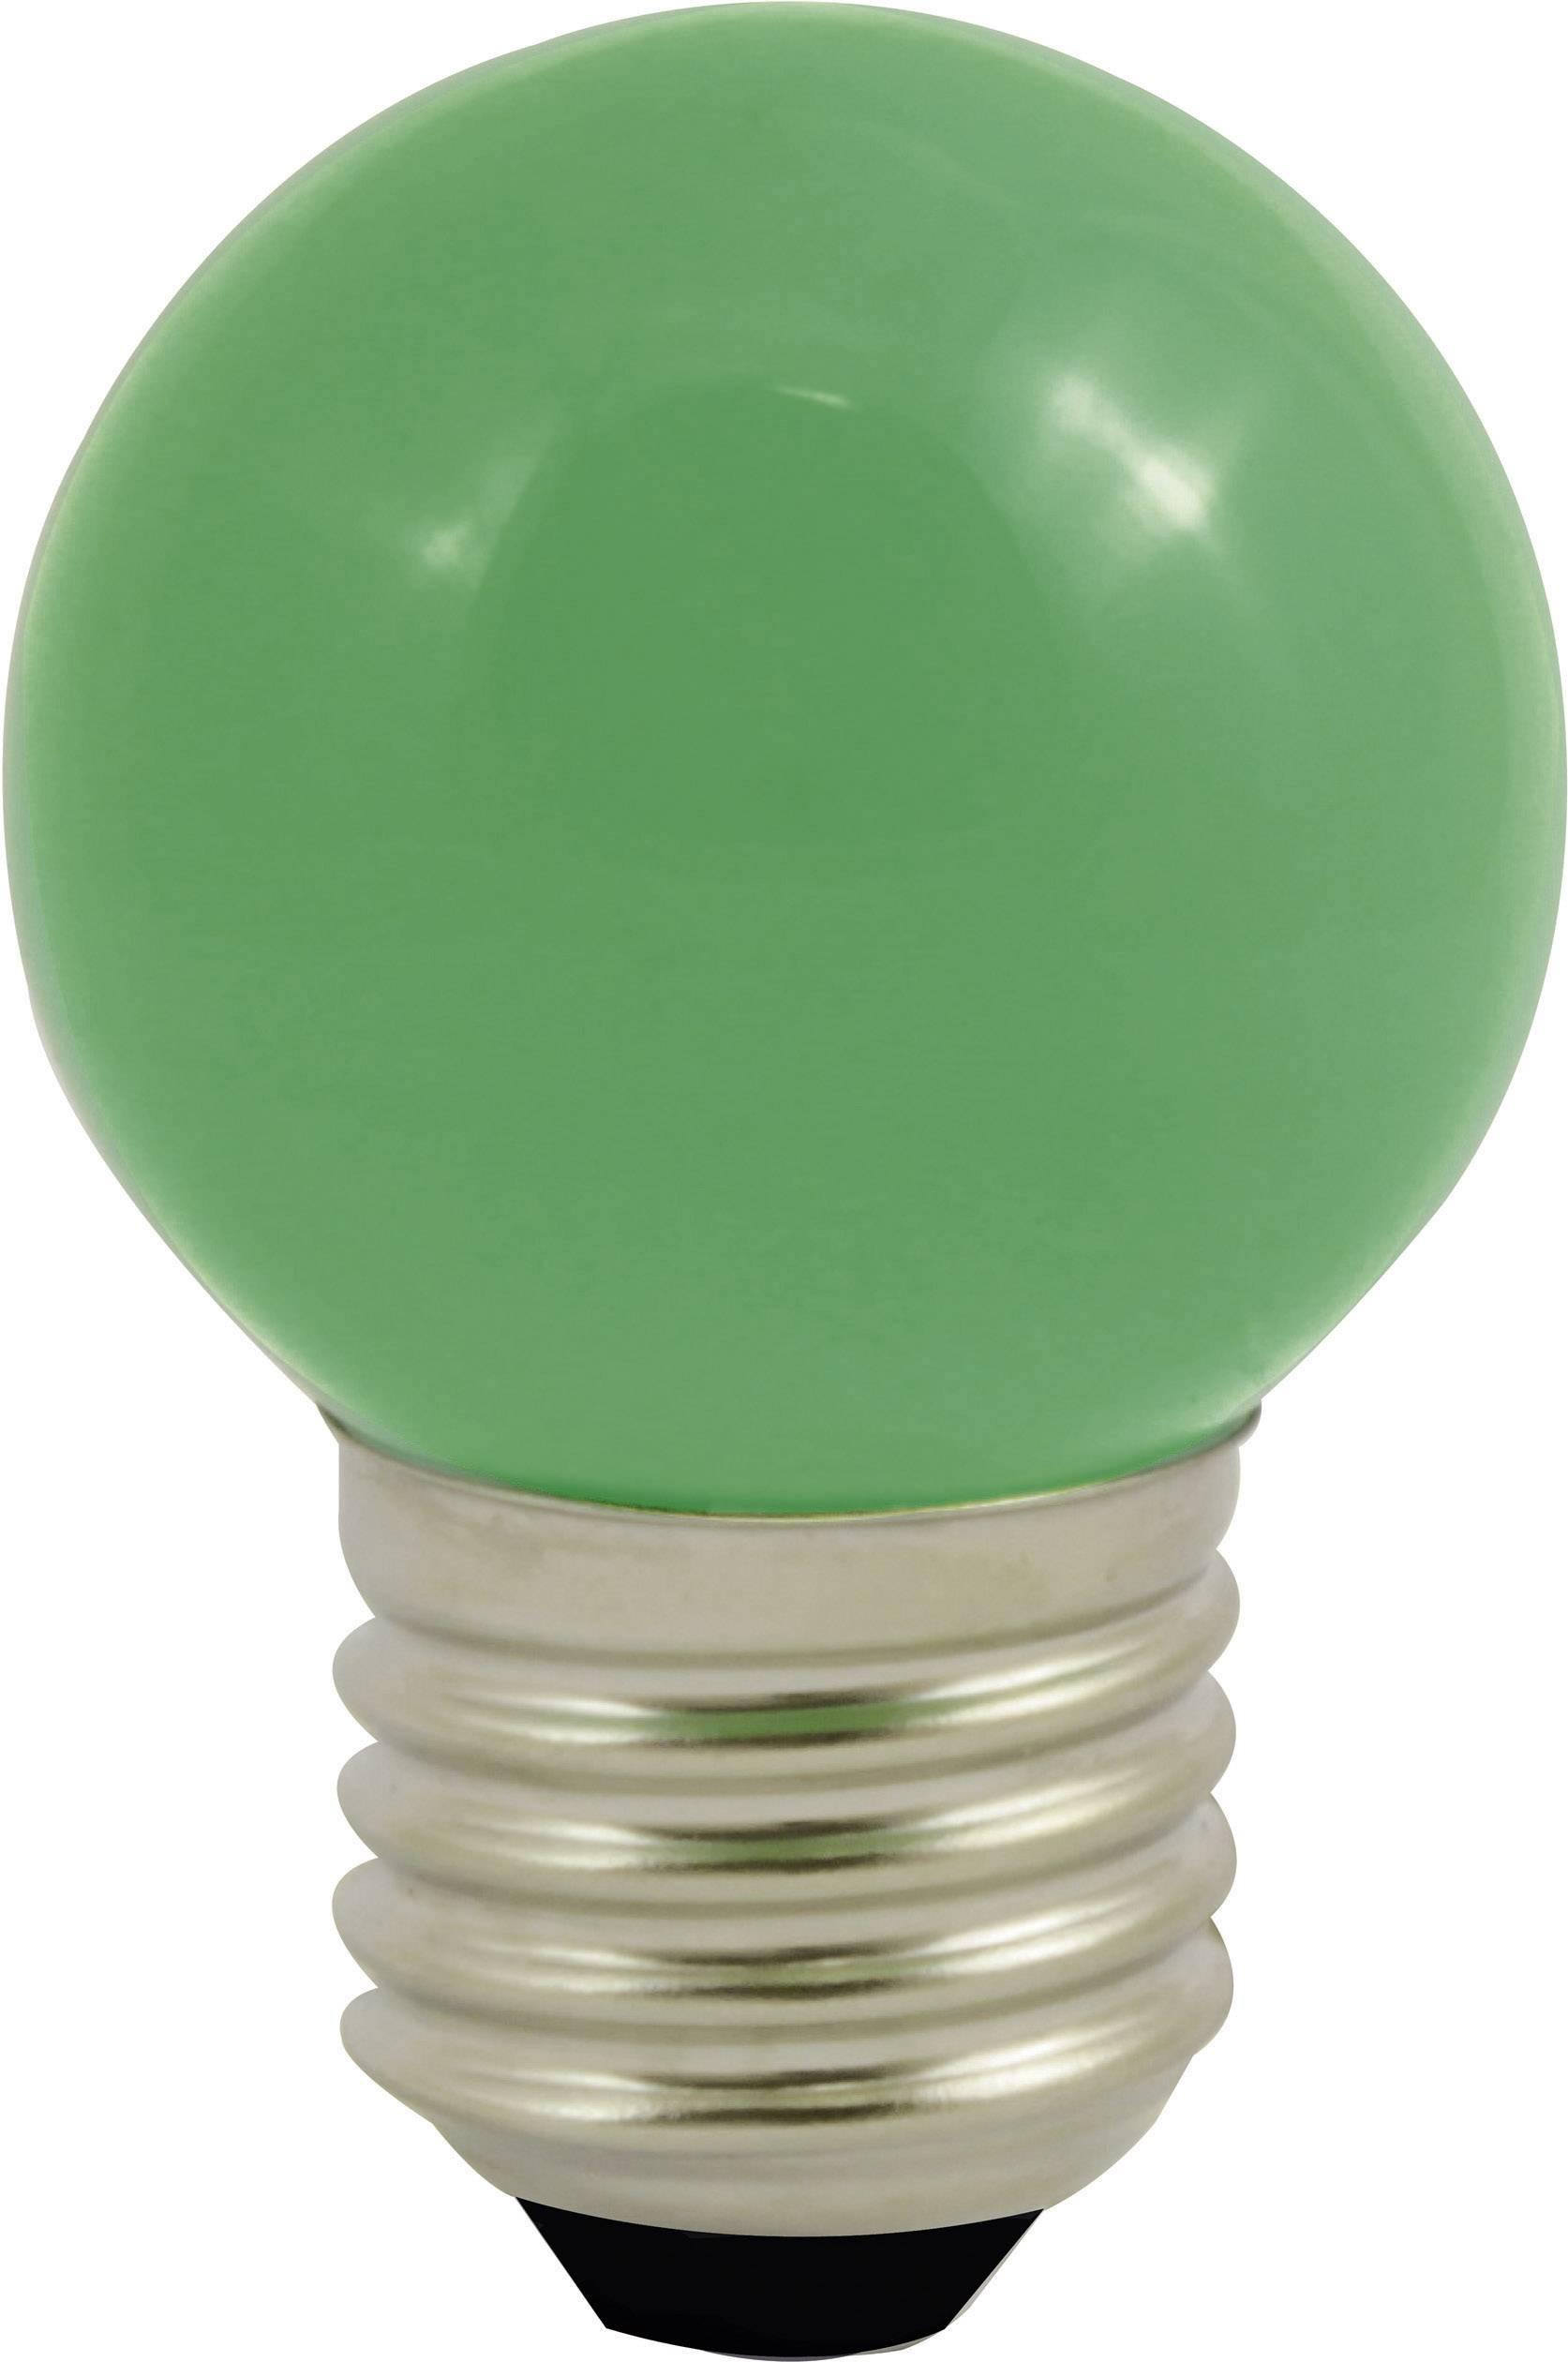 LED žiarovka LightMe LM85252 230 V, 0.5 W, zelená, n/a, 1 ks